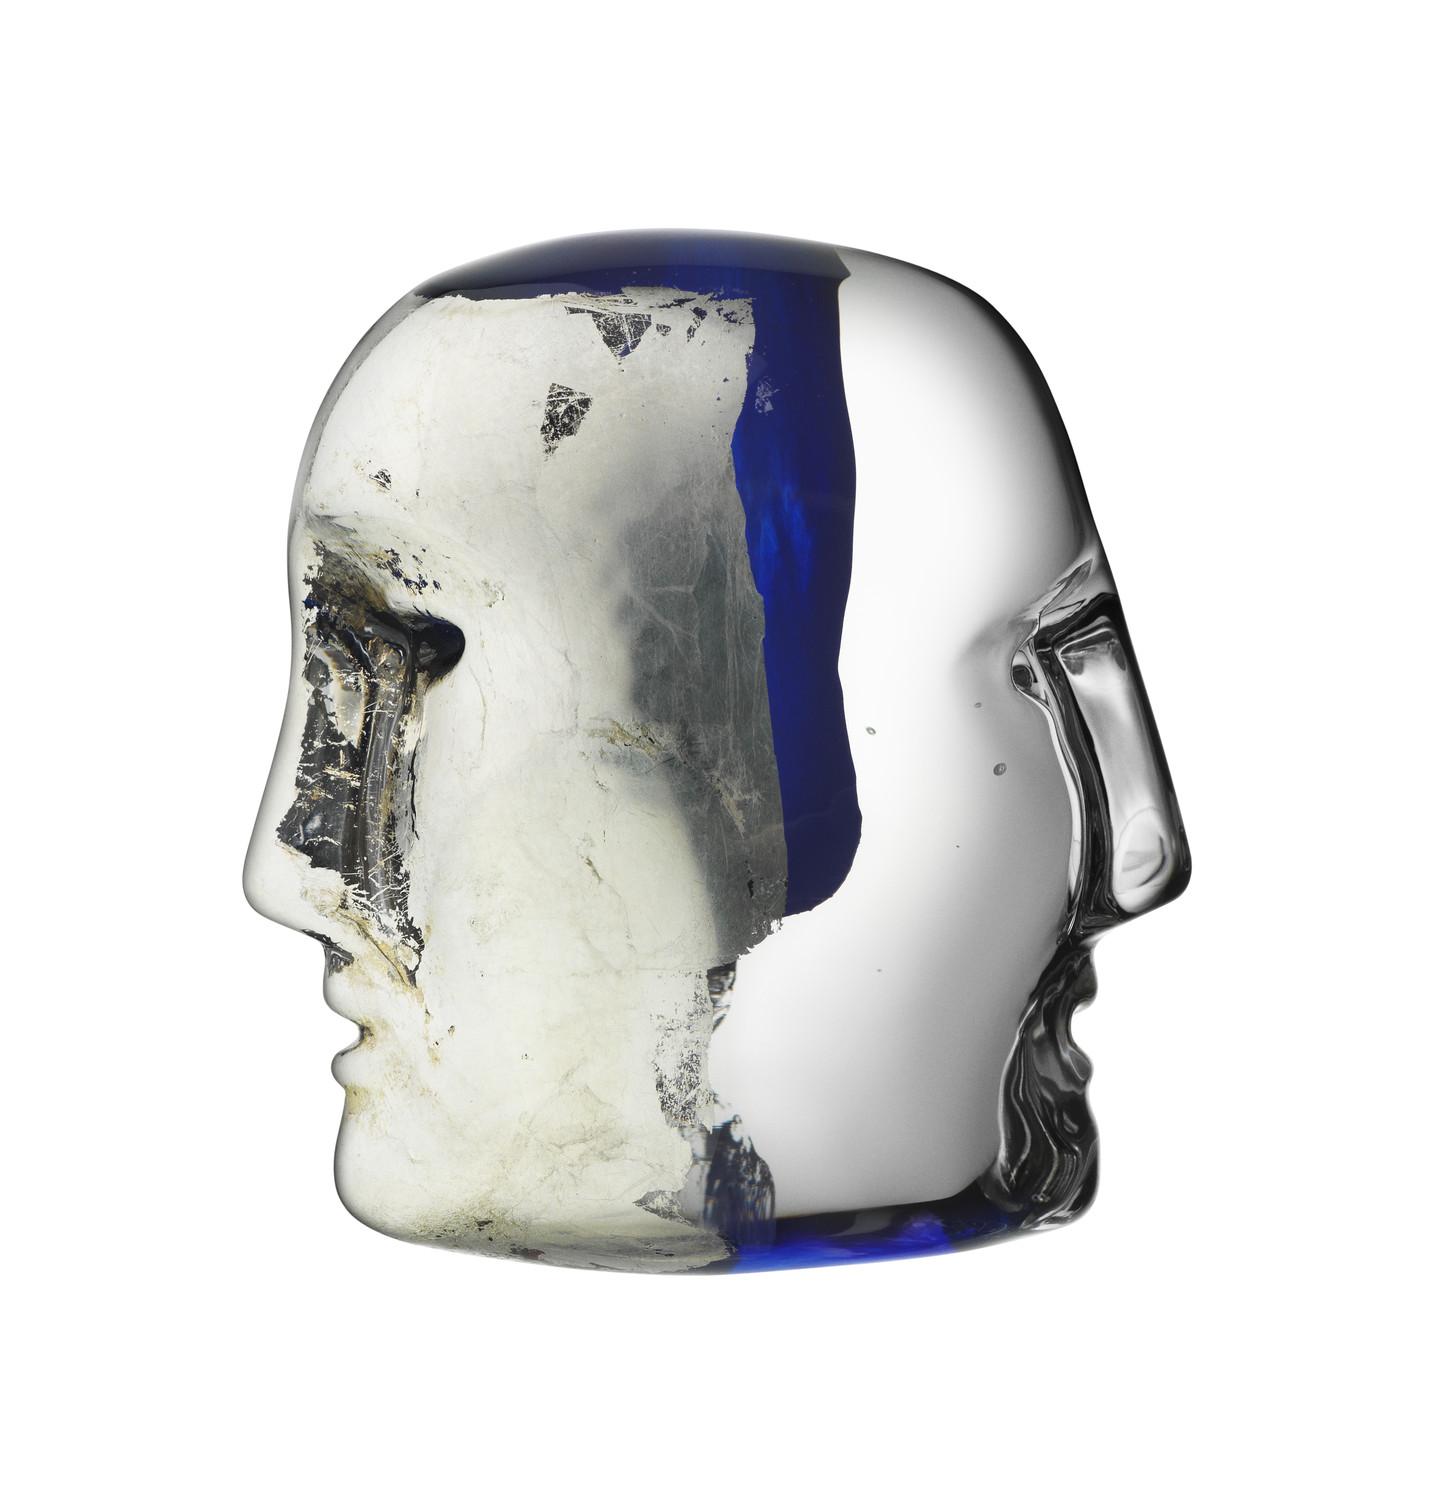 Brains Svart/Blå Janus 7,4 cm